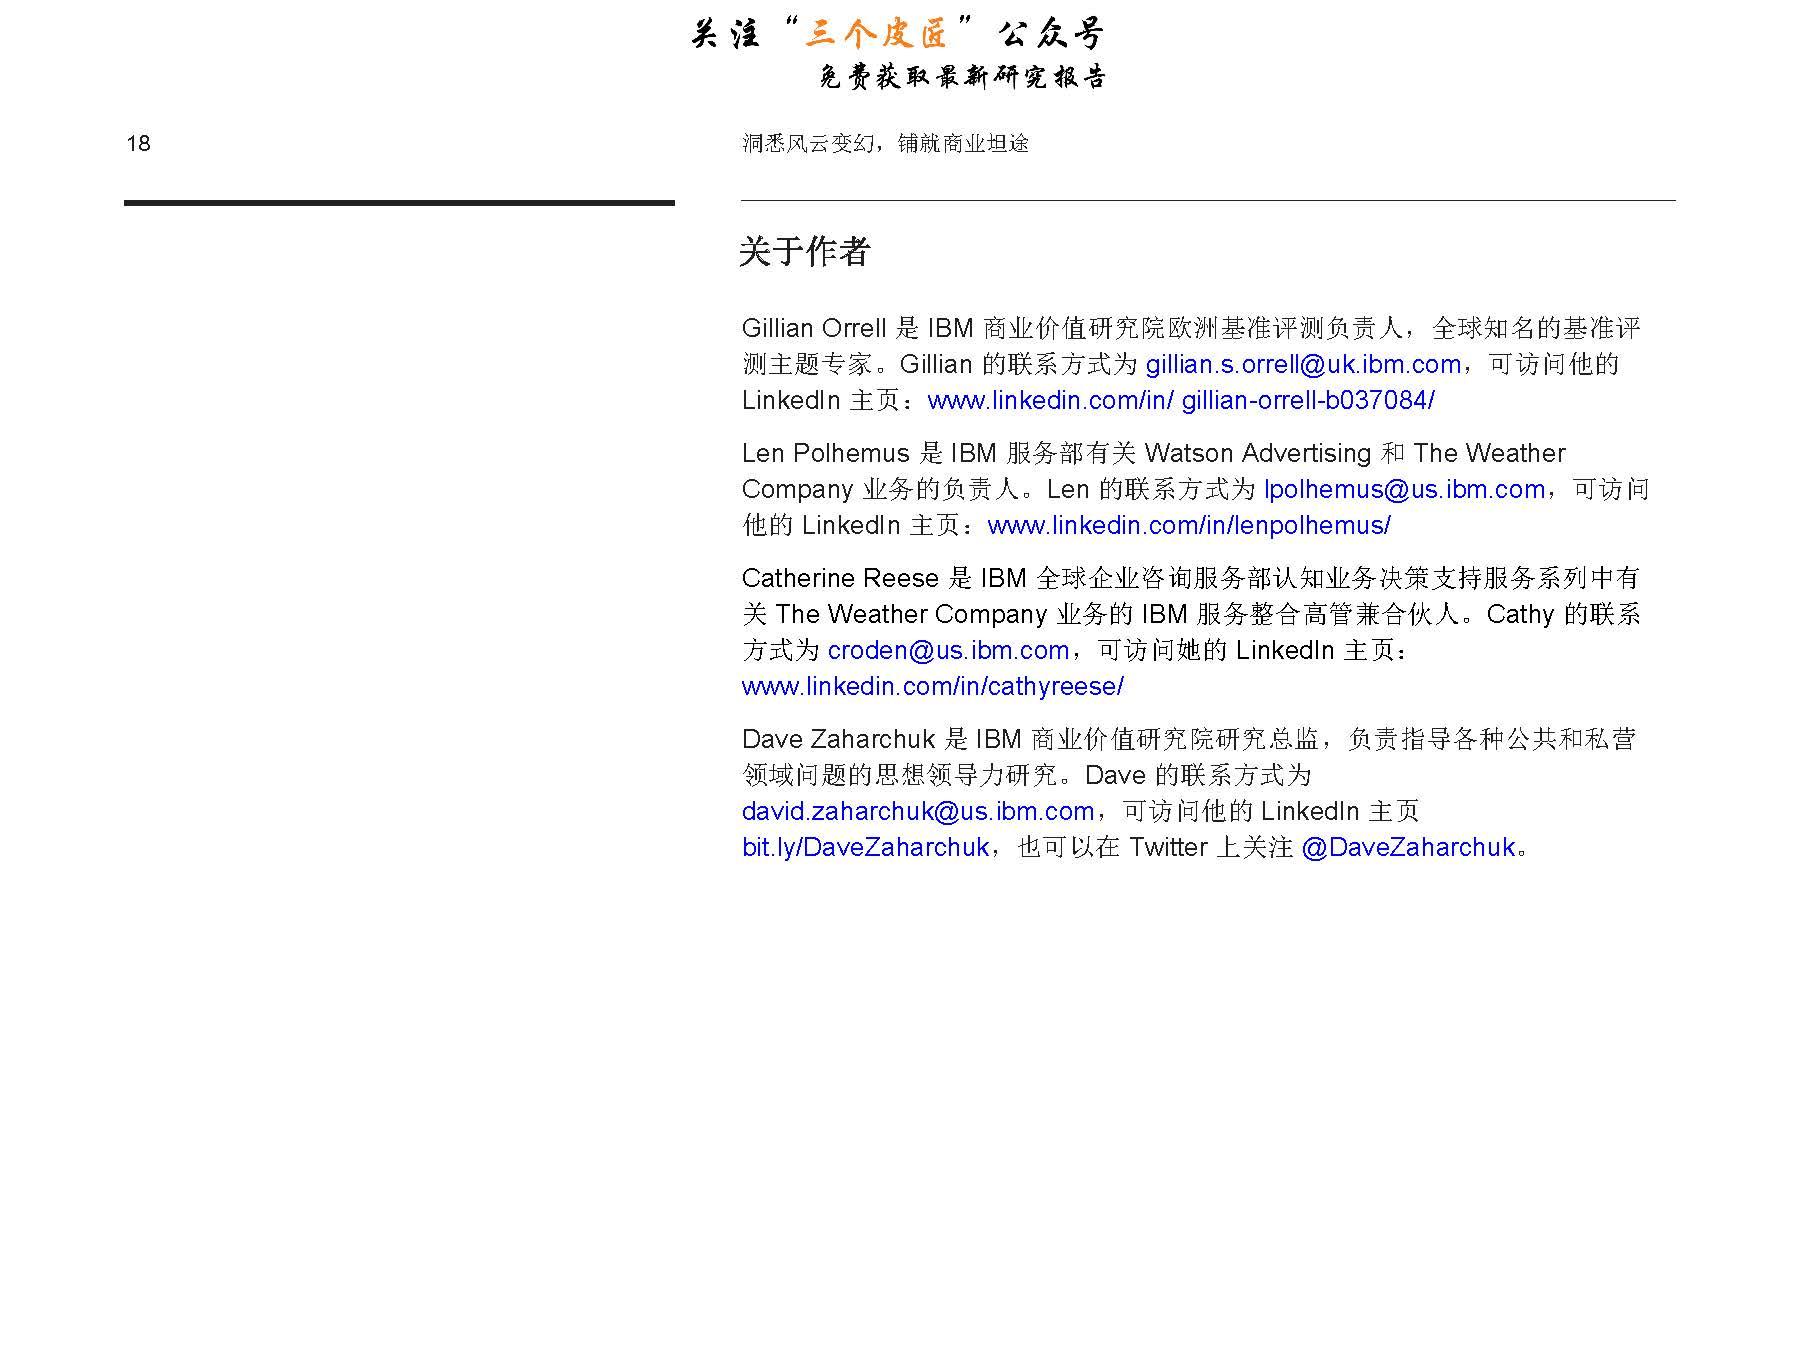 1_Page_20.jpg